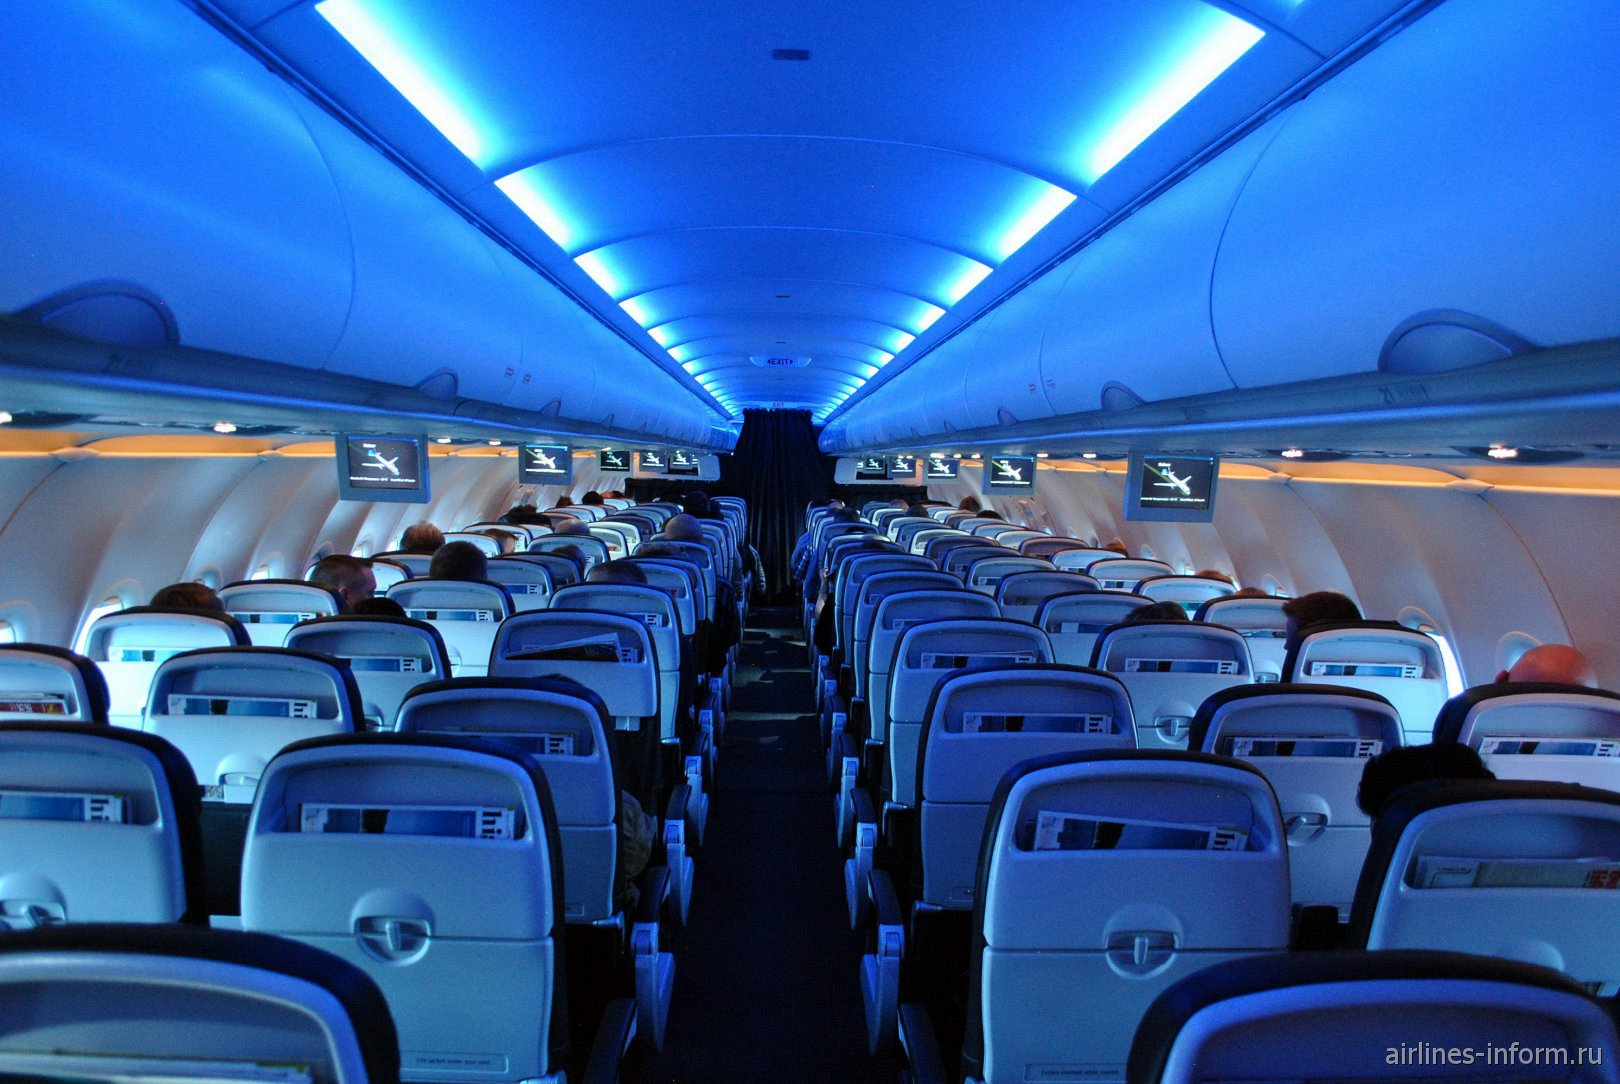 Салон самолета Airbus A320 авиакомпании British Airways